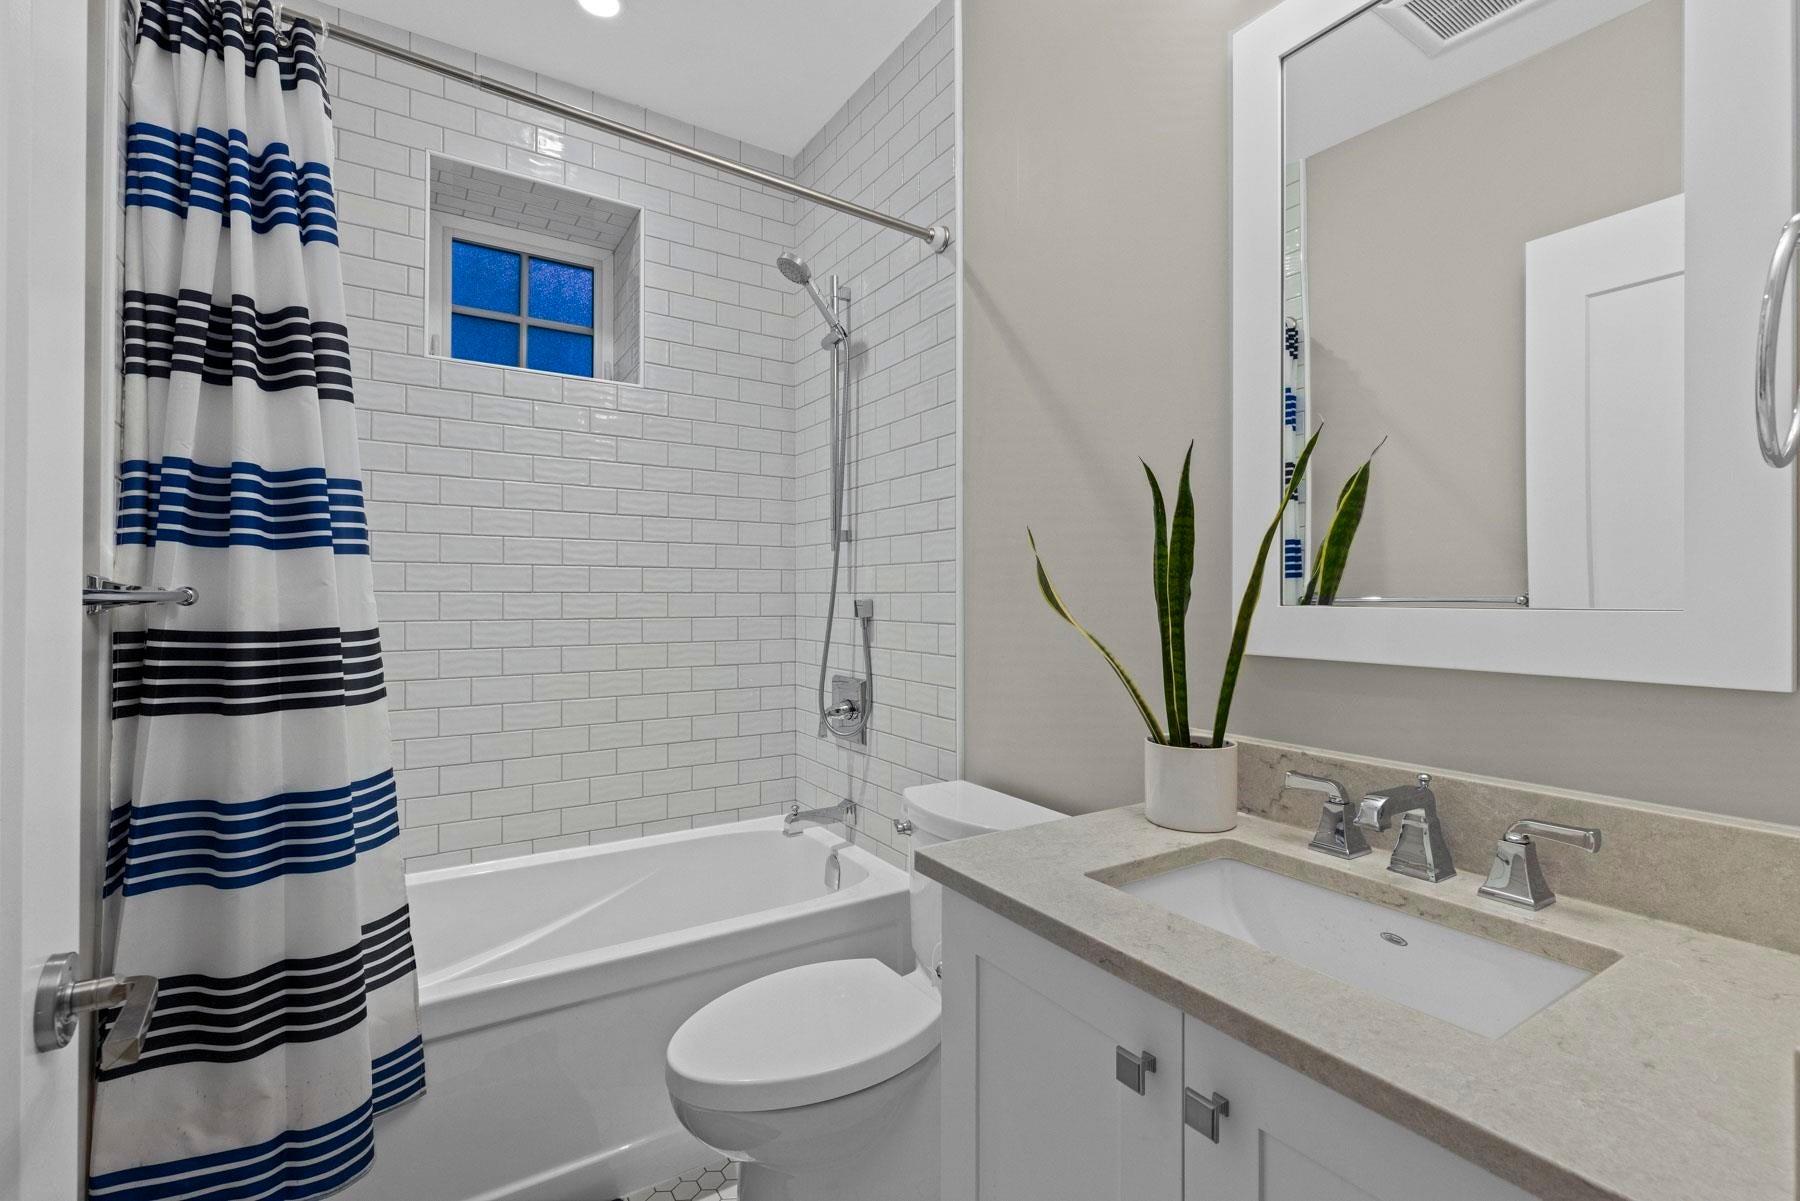 1421 GORDON AVENUE - Ambleside House/Single Family for sale, 3 Bedrooms (R2617756) - #19